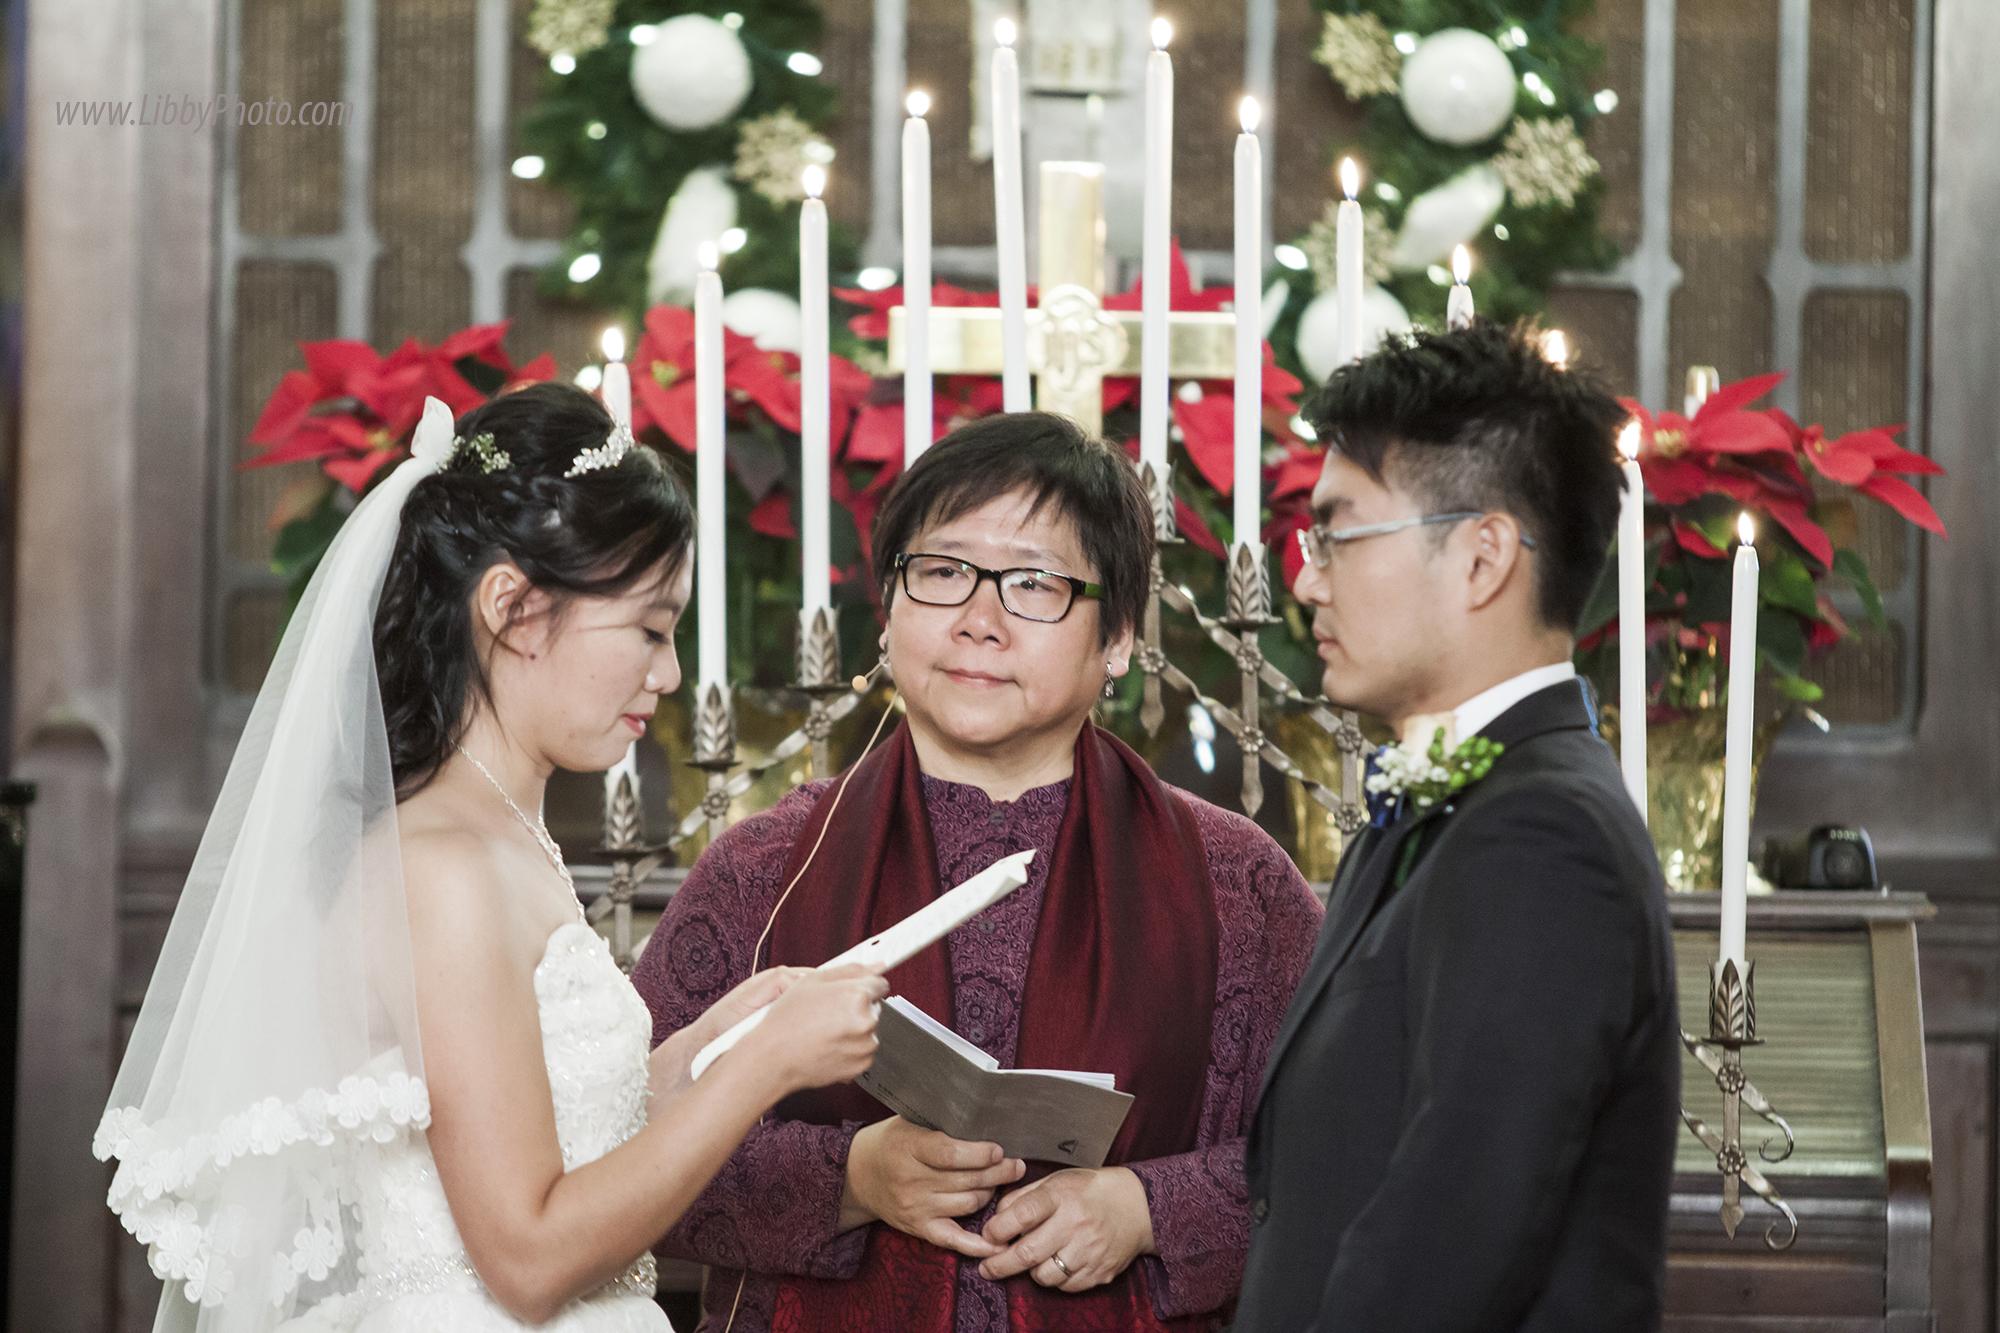 Atlanta wedding photography Libbyphoto (31).jpg